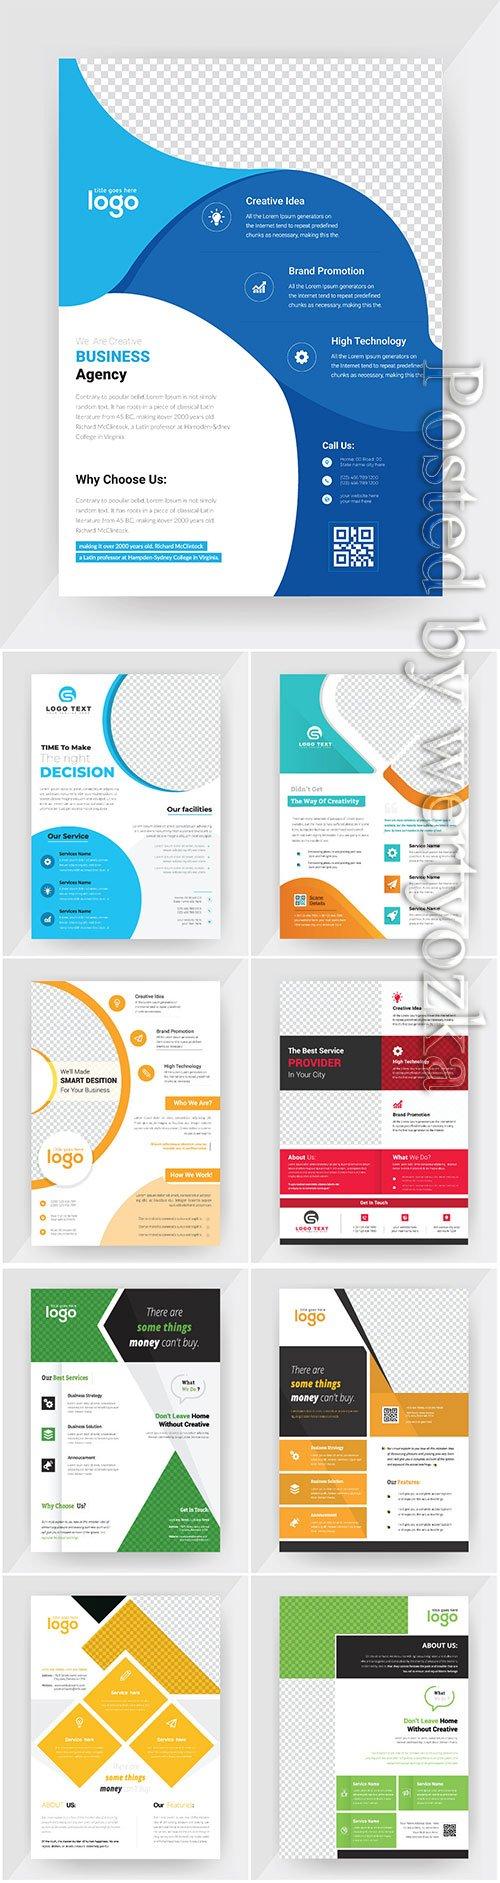 Annual report concept flyer vector template, brochure flat design